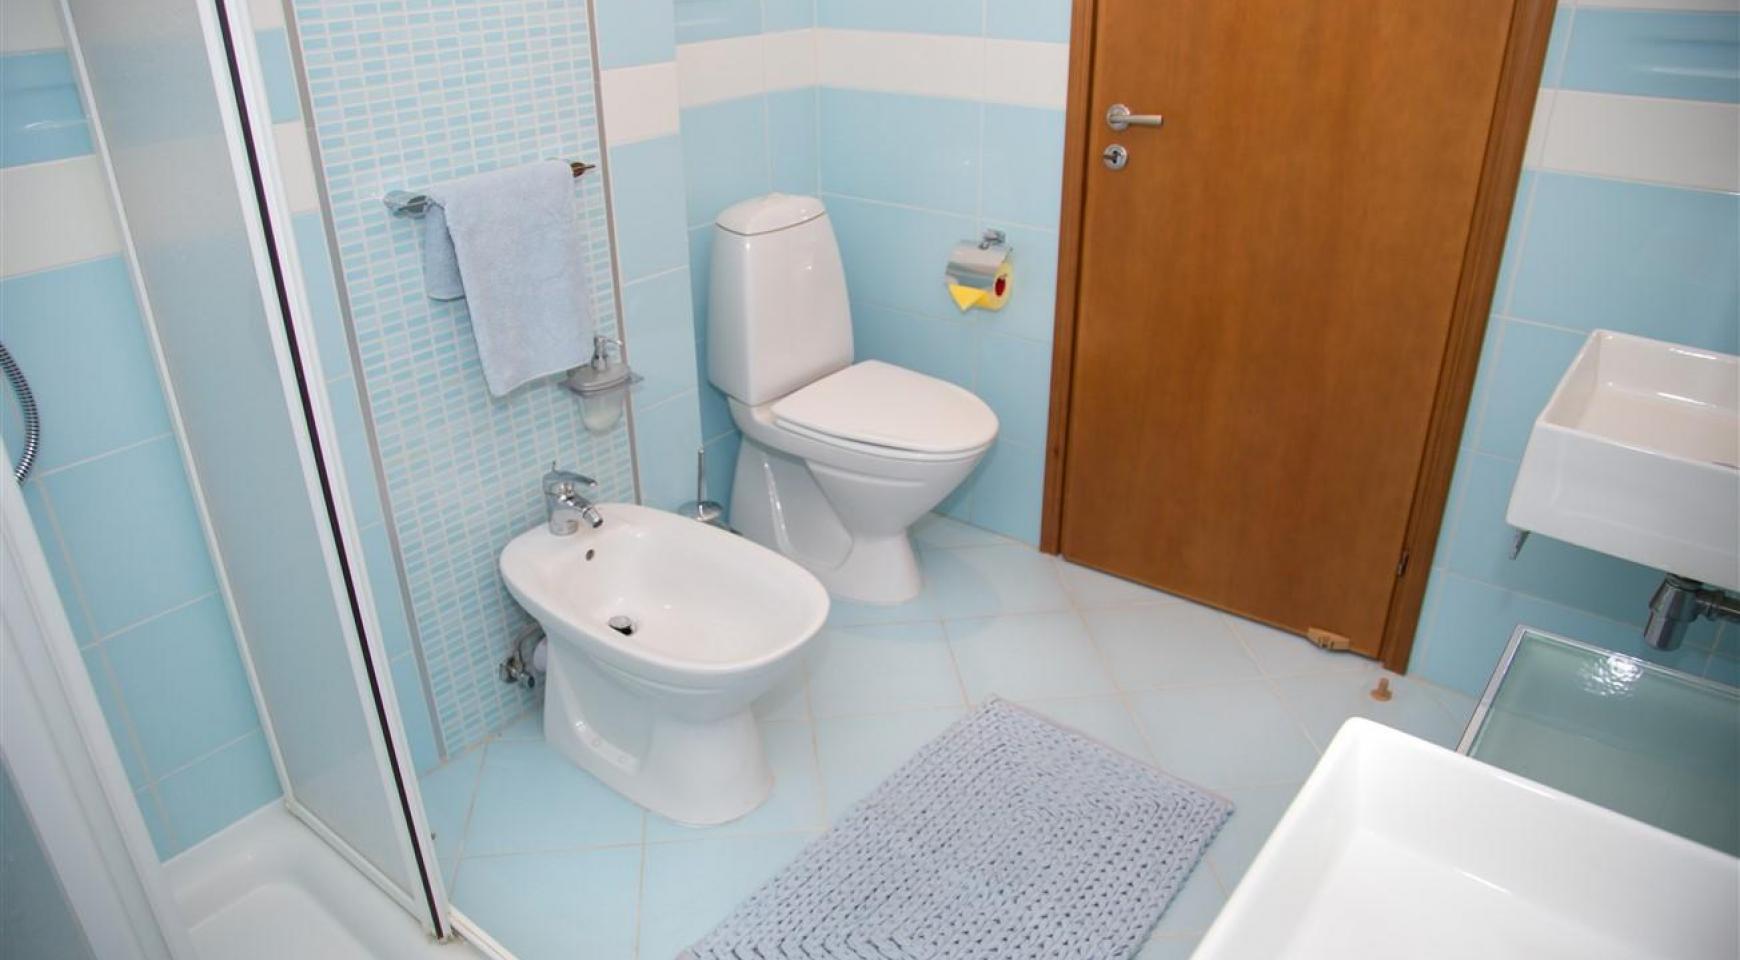 3-Спальная Квартира на Берегу Моря в Комплексе Thera   - 16